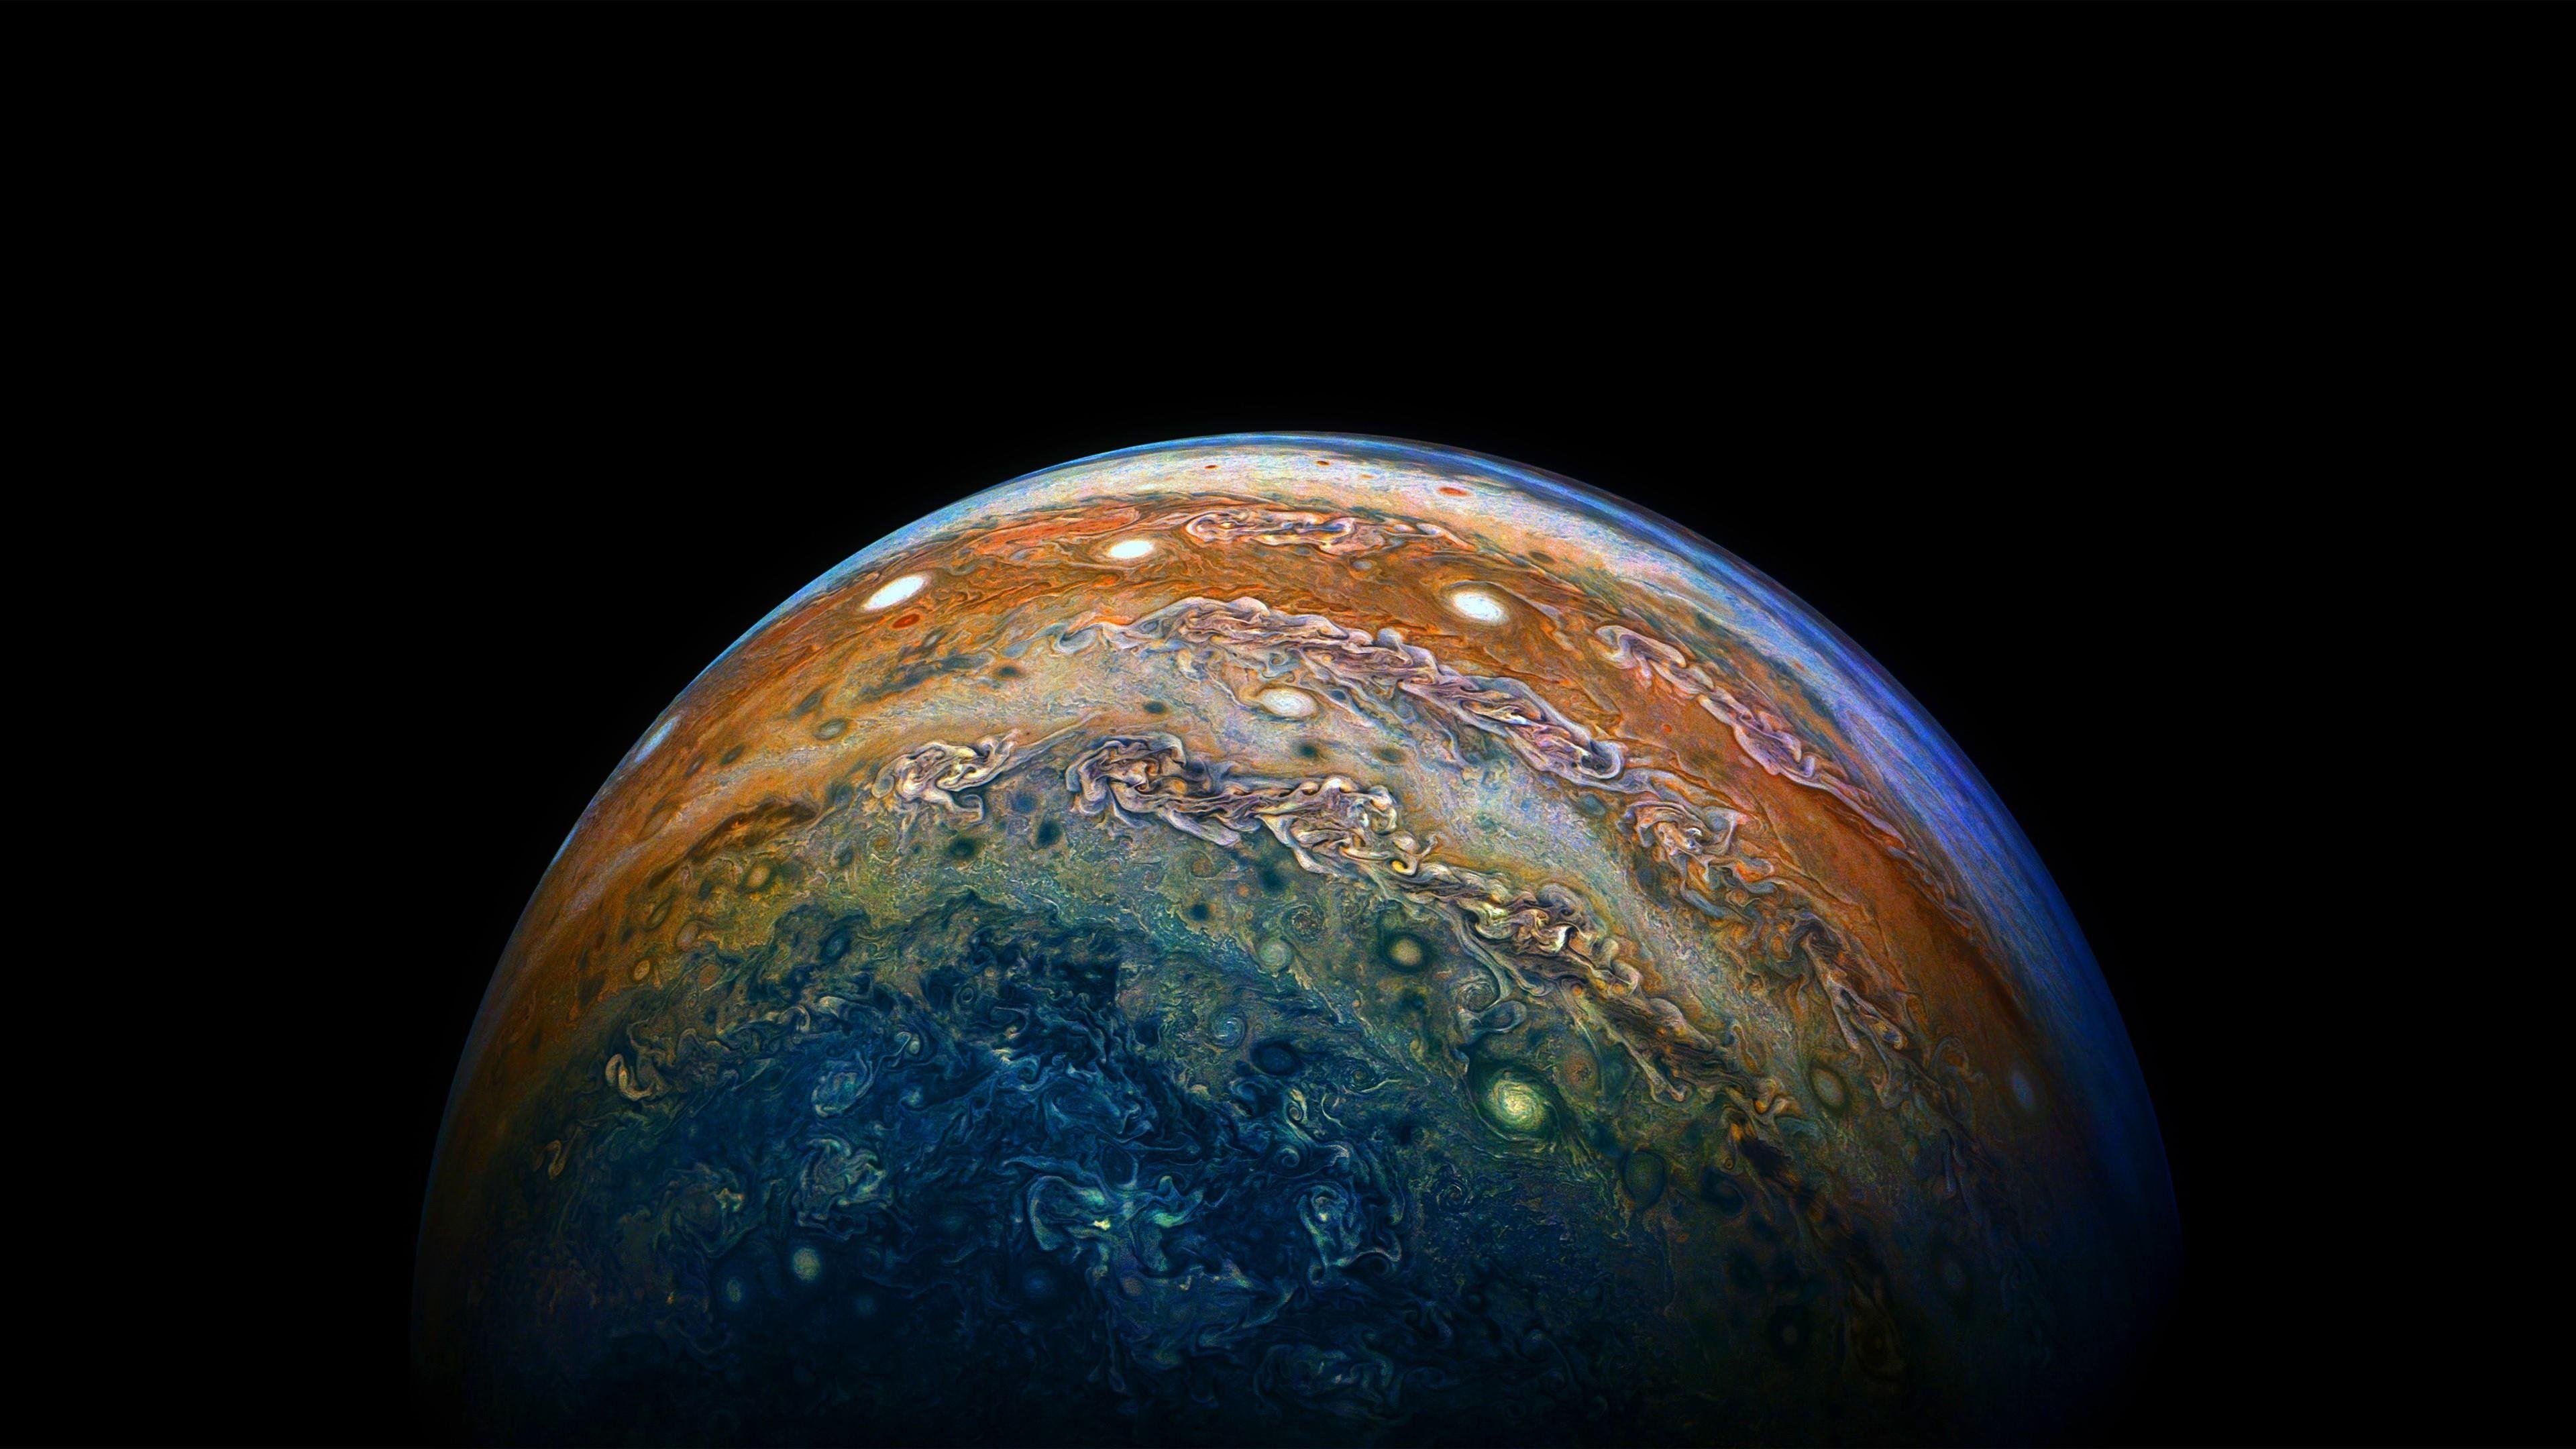 Planet Universe Jupiter Juno Nasa Astronomical Object Space Outer Space Juno Mission Juno Spacecraft Space Photo Jupiter Wallpaper Jupiter Nasa Wallpaper